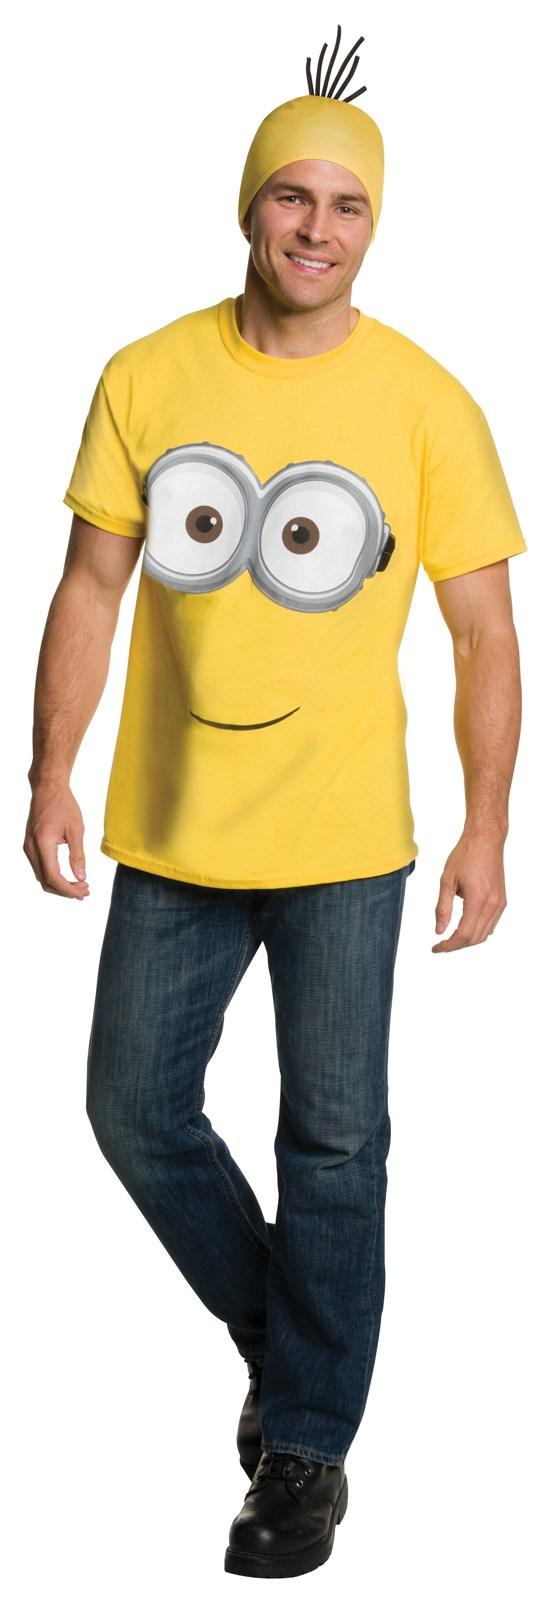 Minions Movie: Minion Shirt & Headpiece For Adults